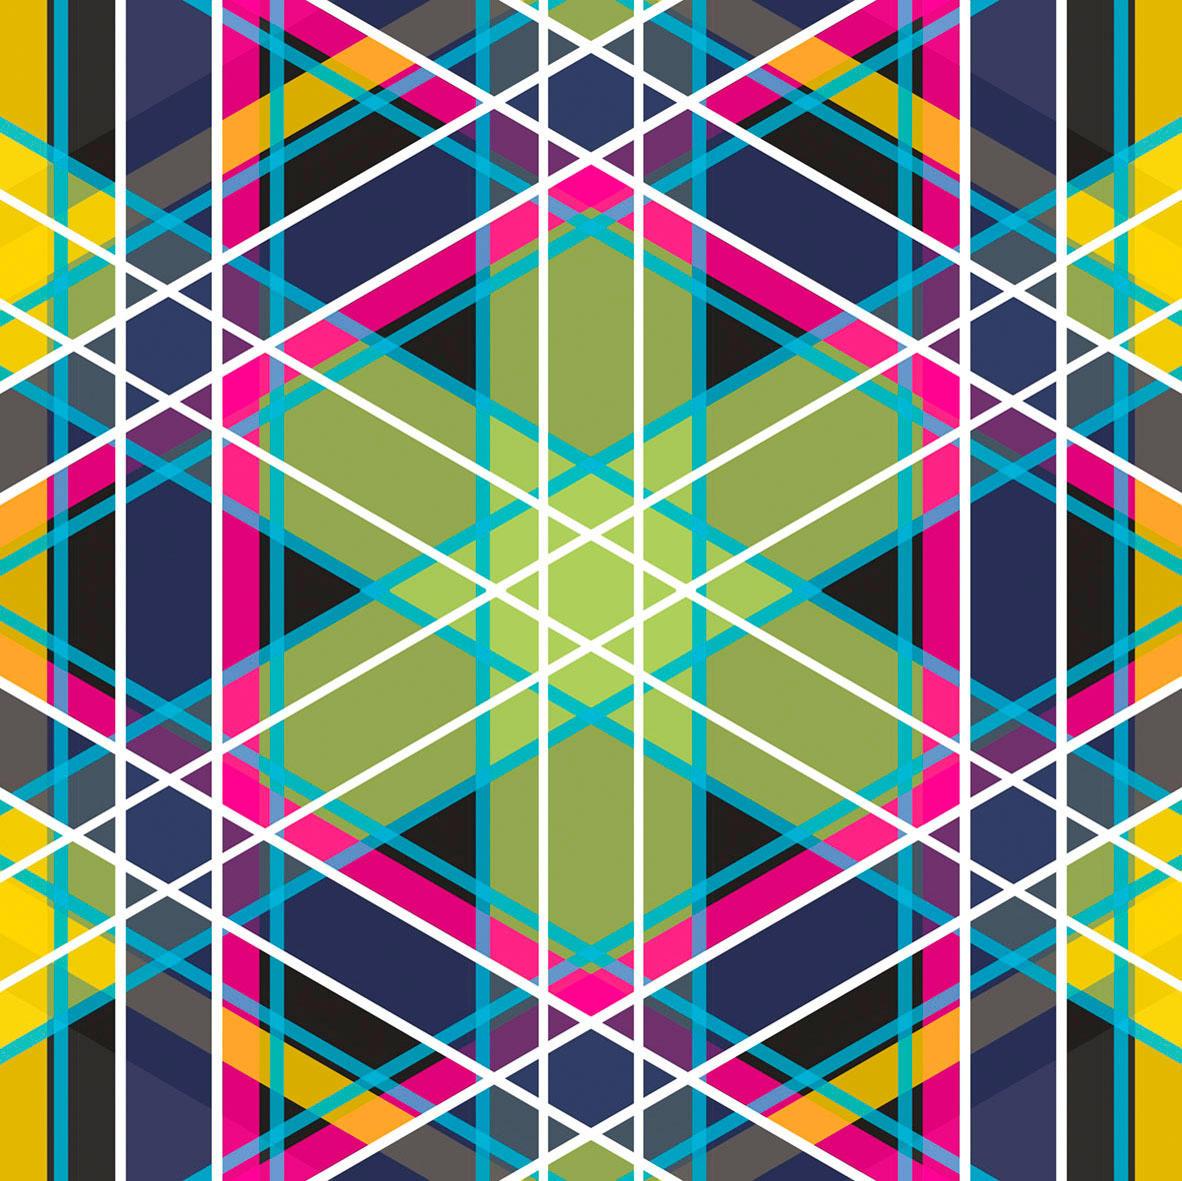 TARTAN QUILT | SAND - Wall-to-wall carpets from moooi carpets ... : tartan quilt - Adamdwight.com